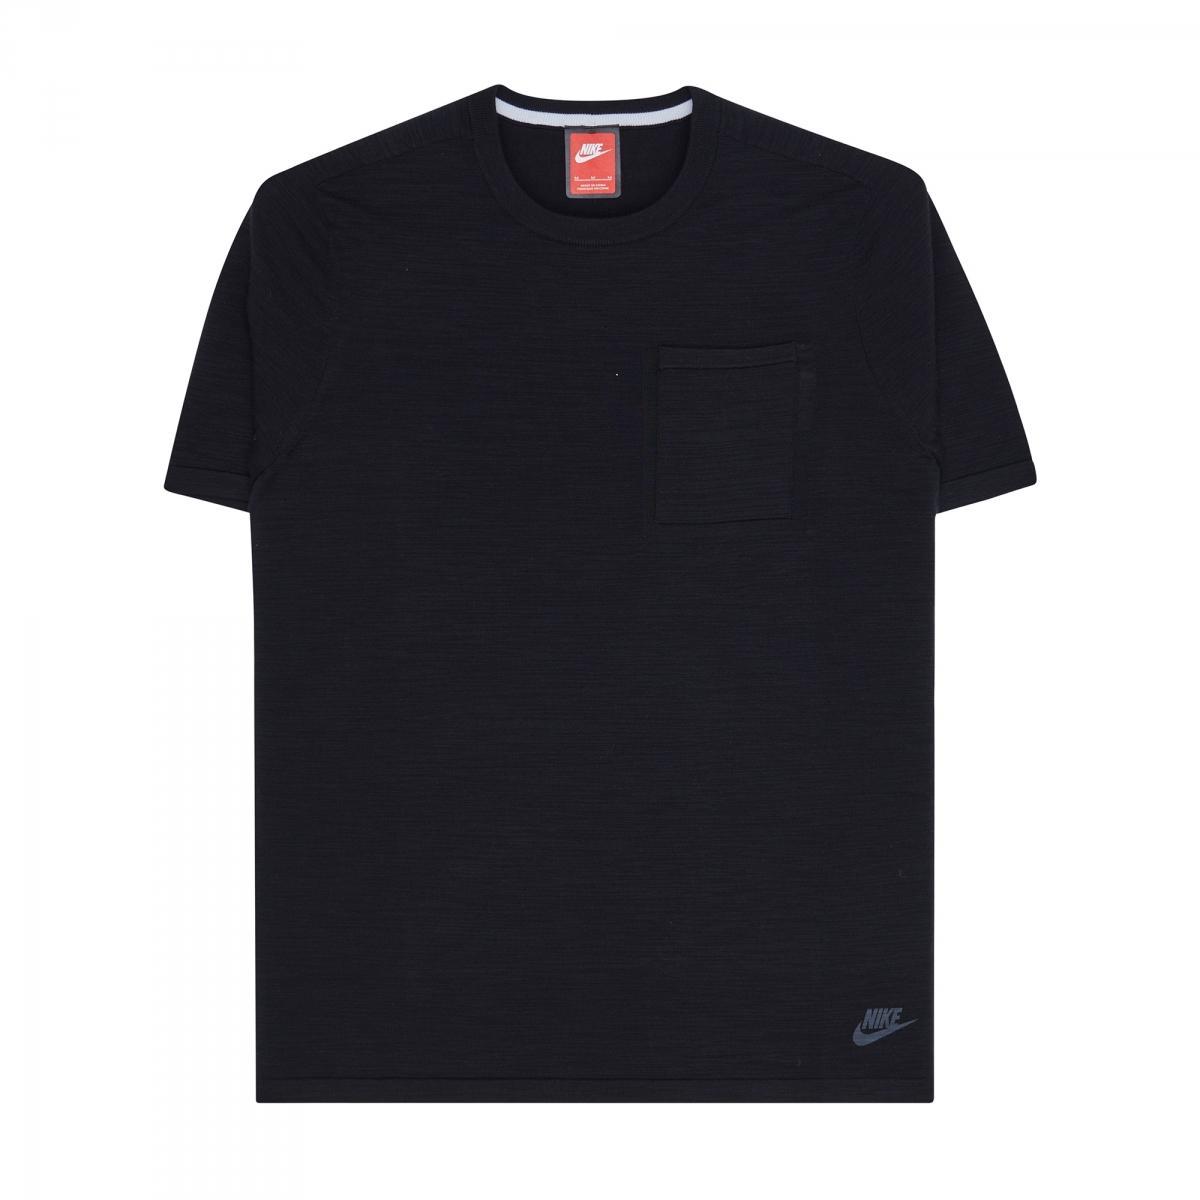 81303797c Nike Tech Knit Pocket T-shirt in Black for Men - Lyst